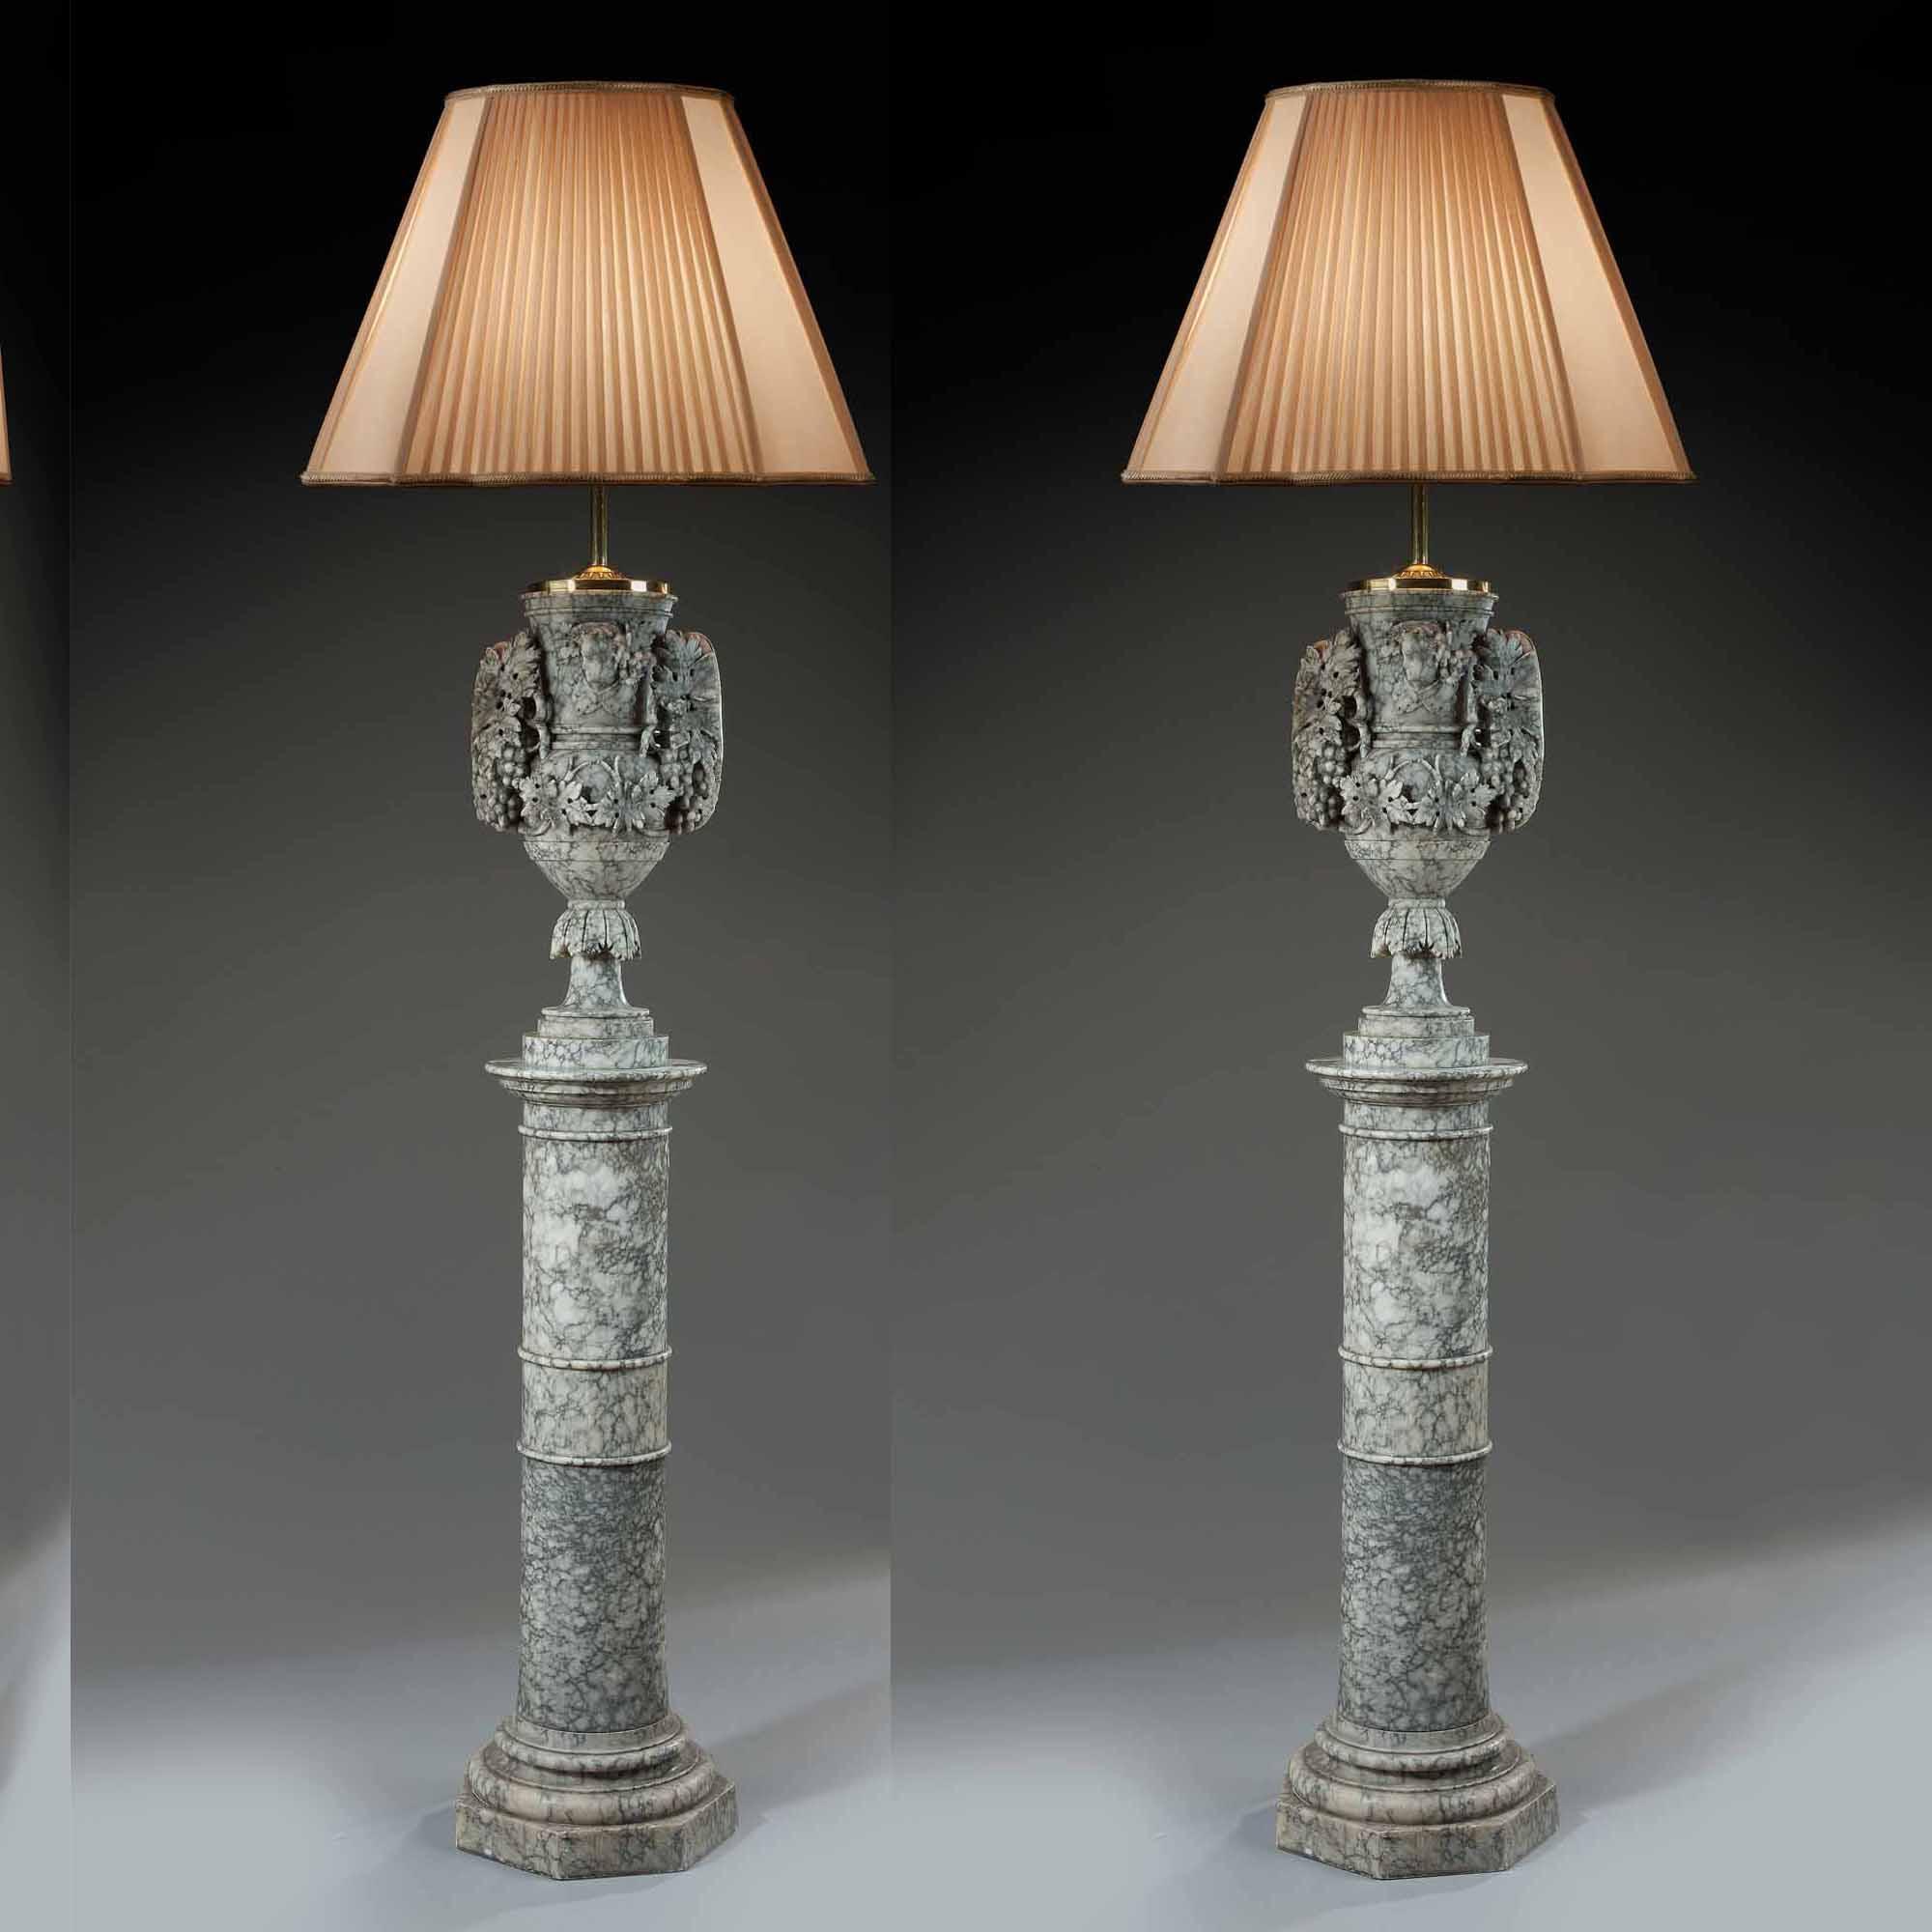 antique_floor_lamp_french_alabaster_8006_d